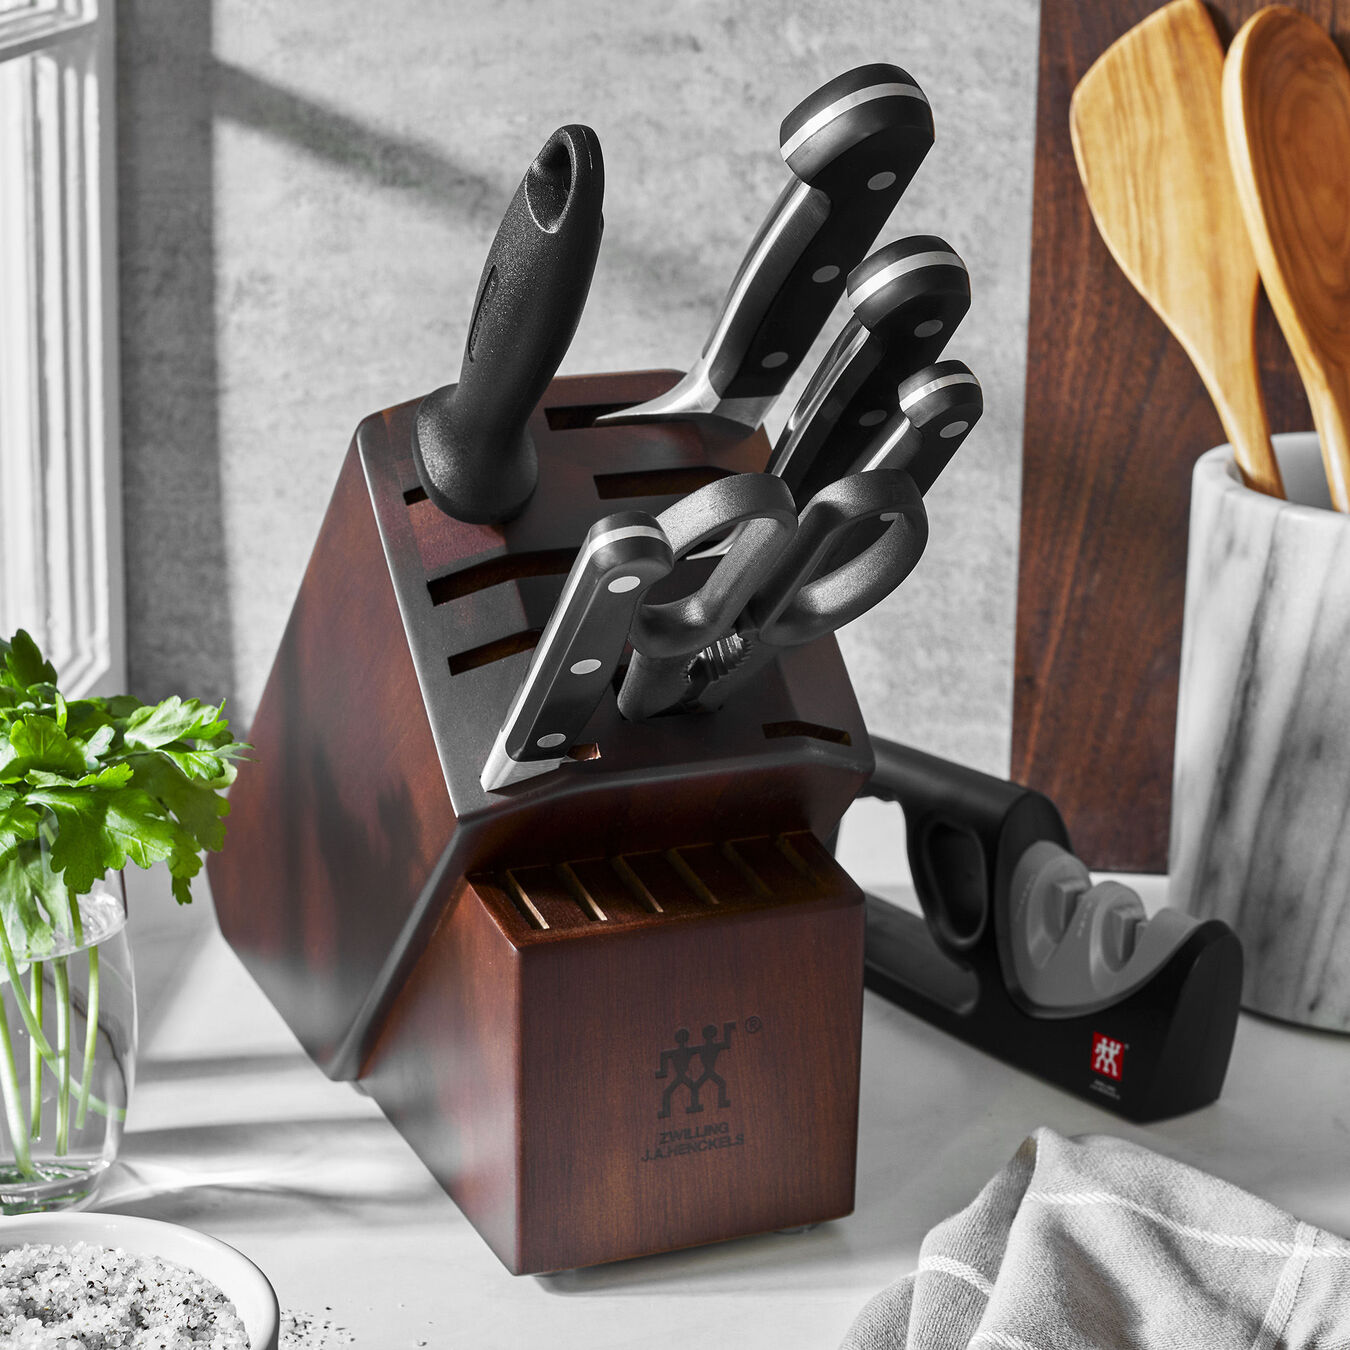 7-pc Knife Block Set with Bonus Sharpener,,large 2